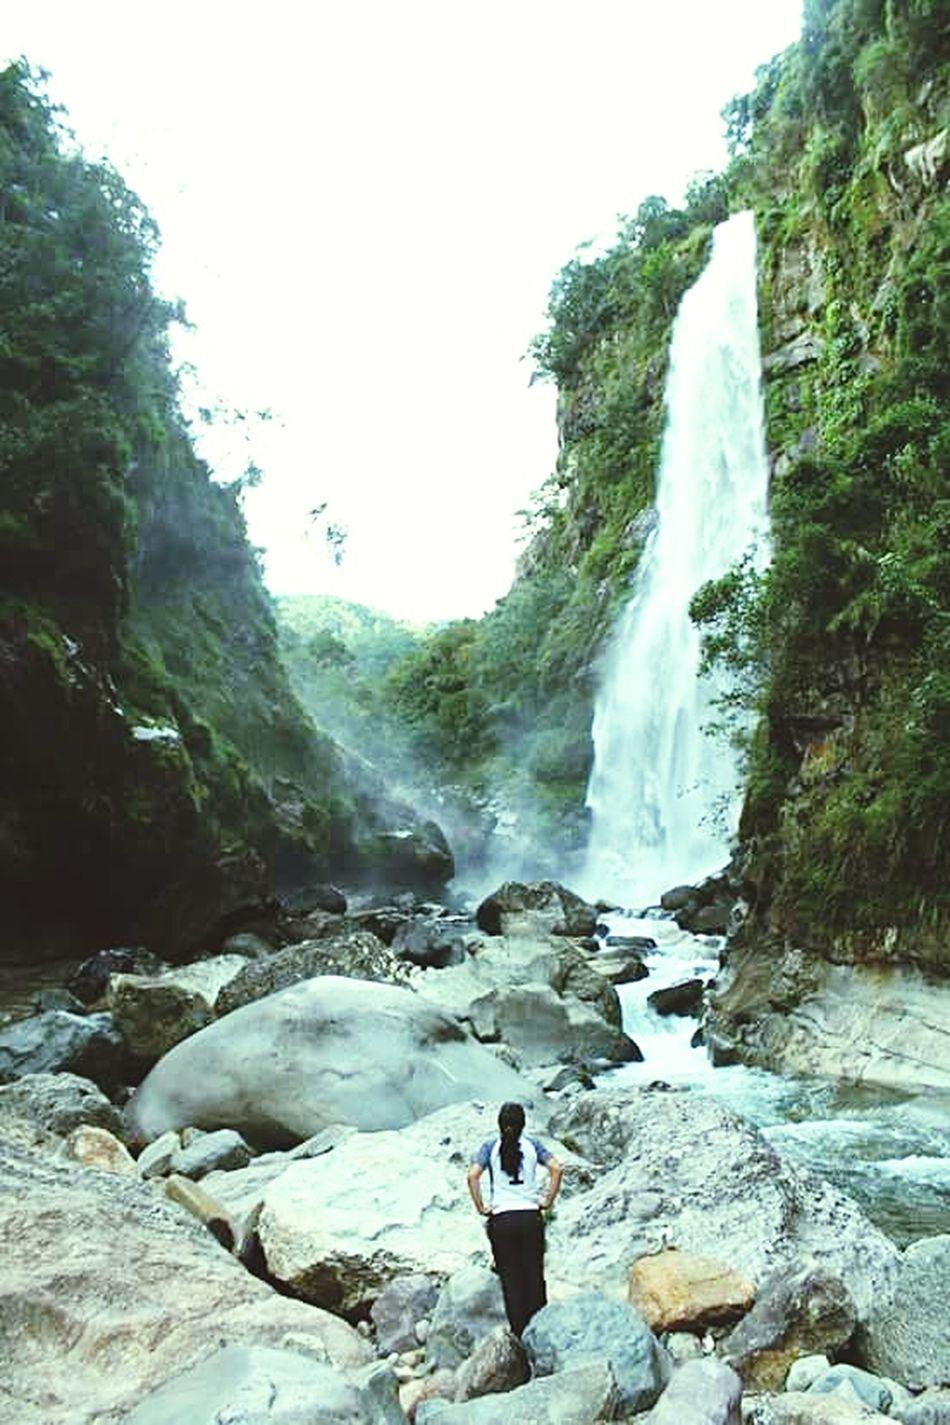 Waterfall Water Flowing Water Beauty In Nature Nature Tourism Flowing Wheninsagada Sagada Adventure Meditation Sagada, Philippines